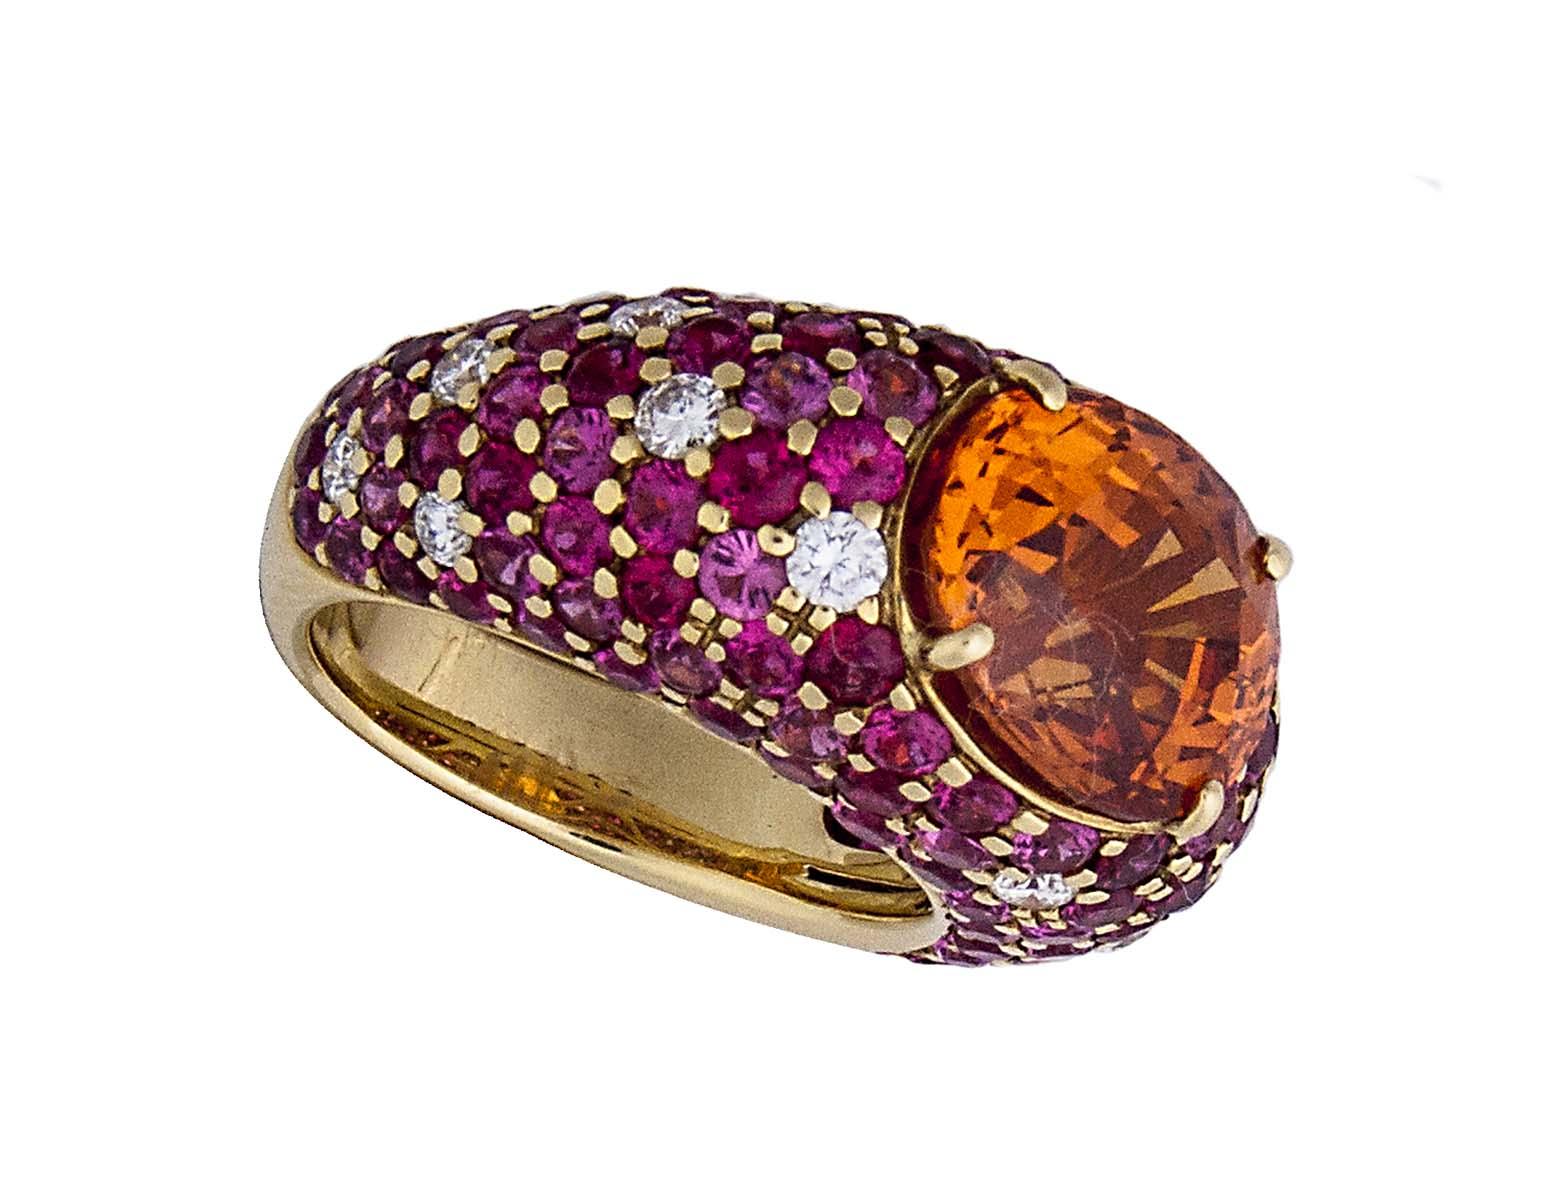 18k RARE spessartine garnet ring with spinel and diamonds